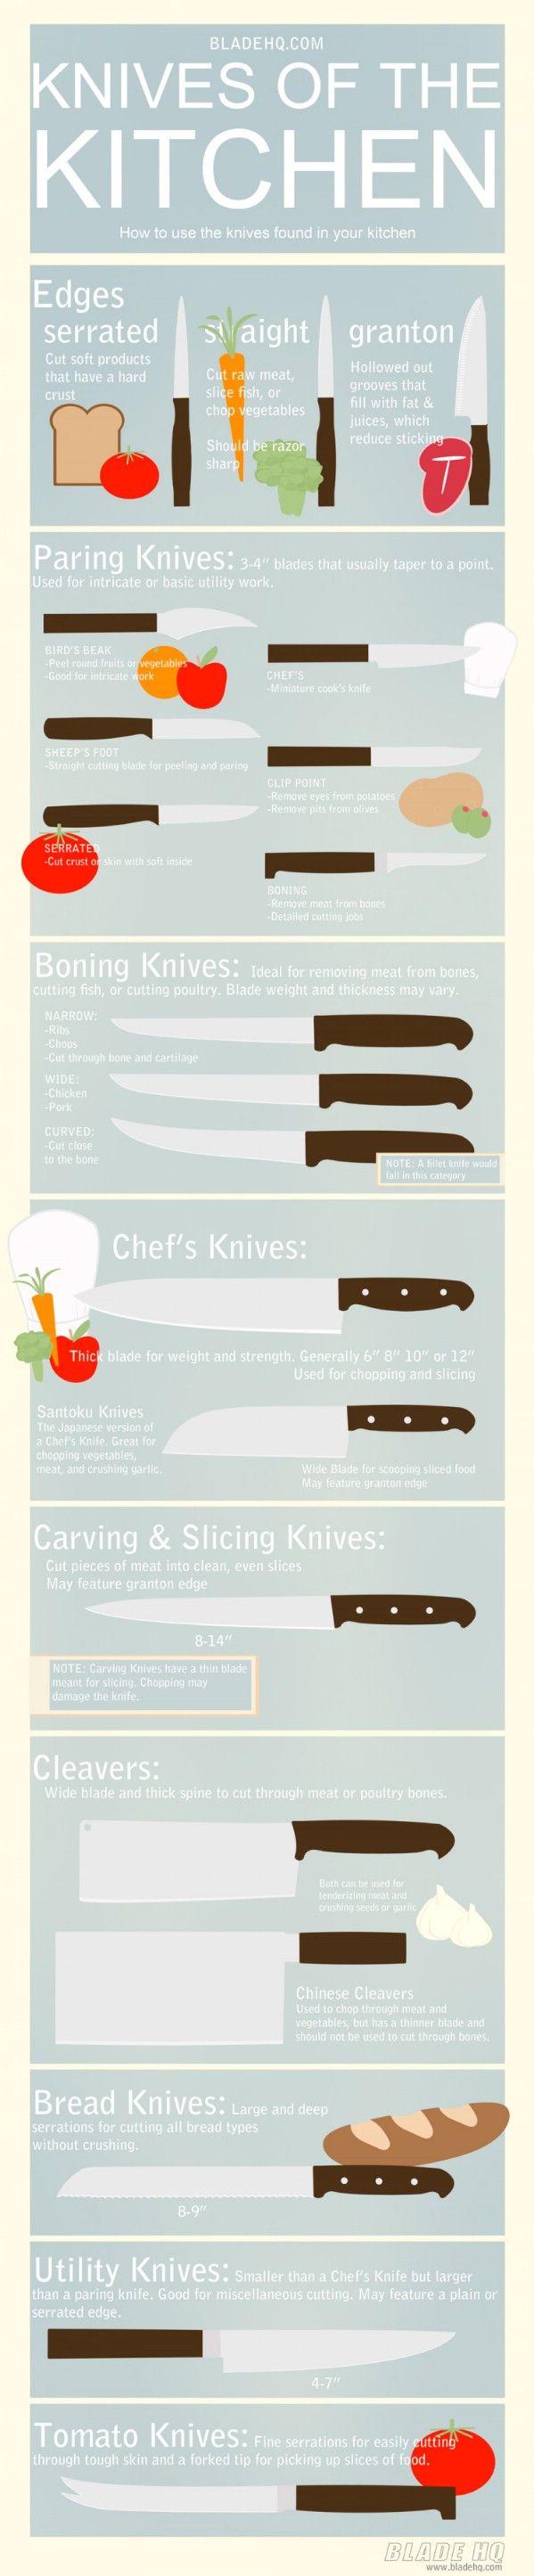 18 best Knife Care images on Pinterest | Kitchen knives, Cooking ...